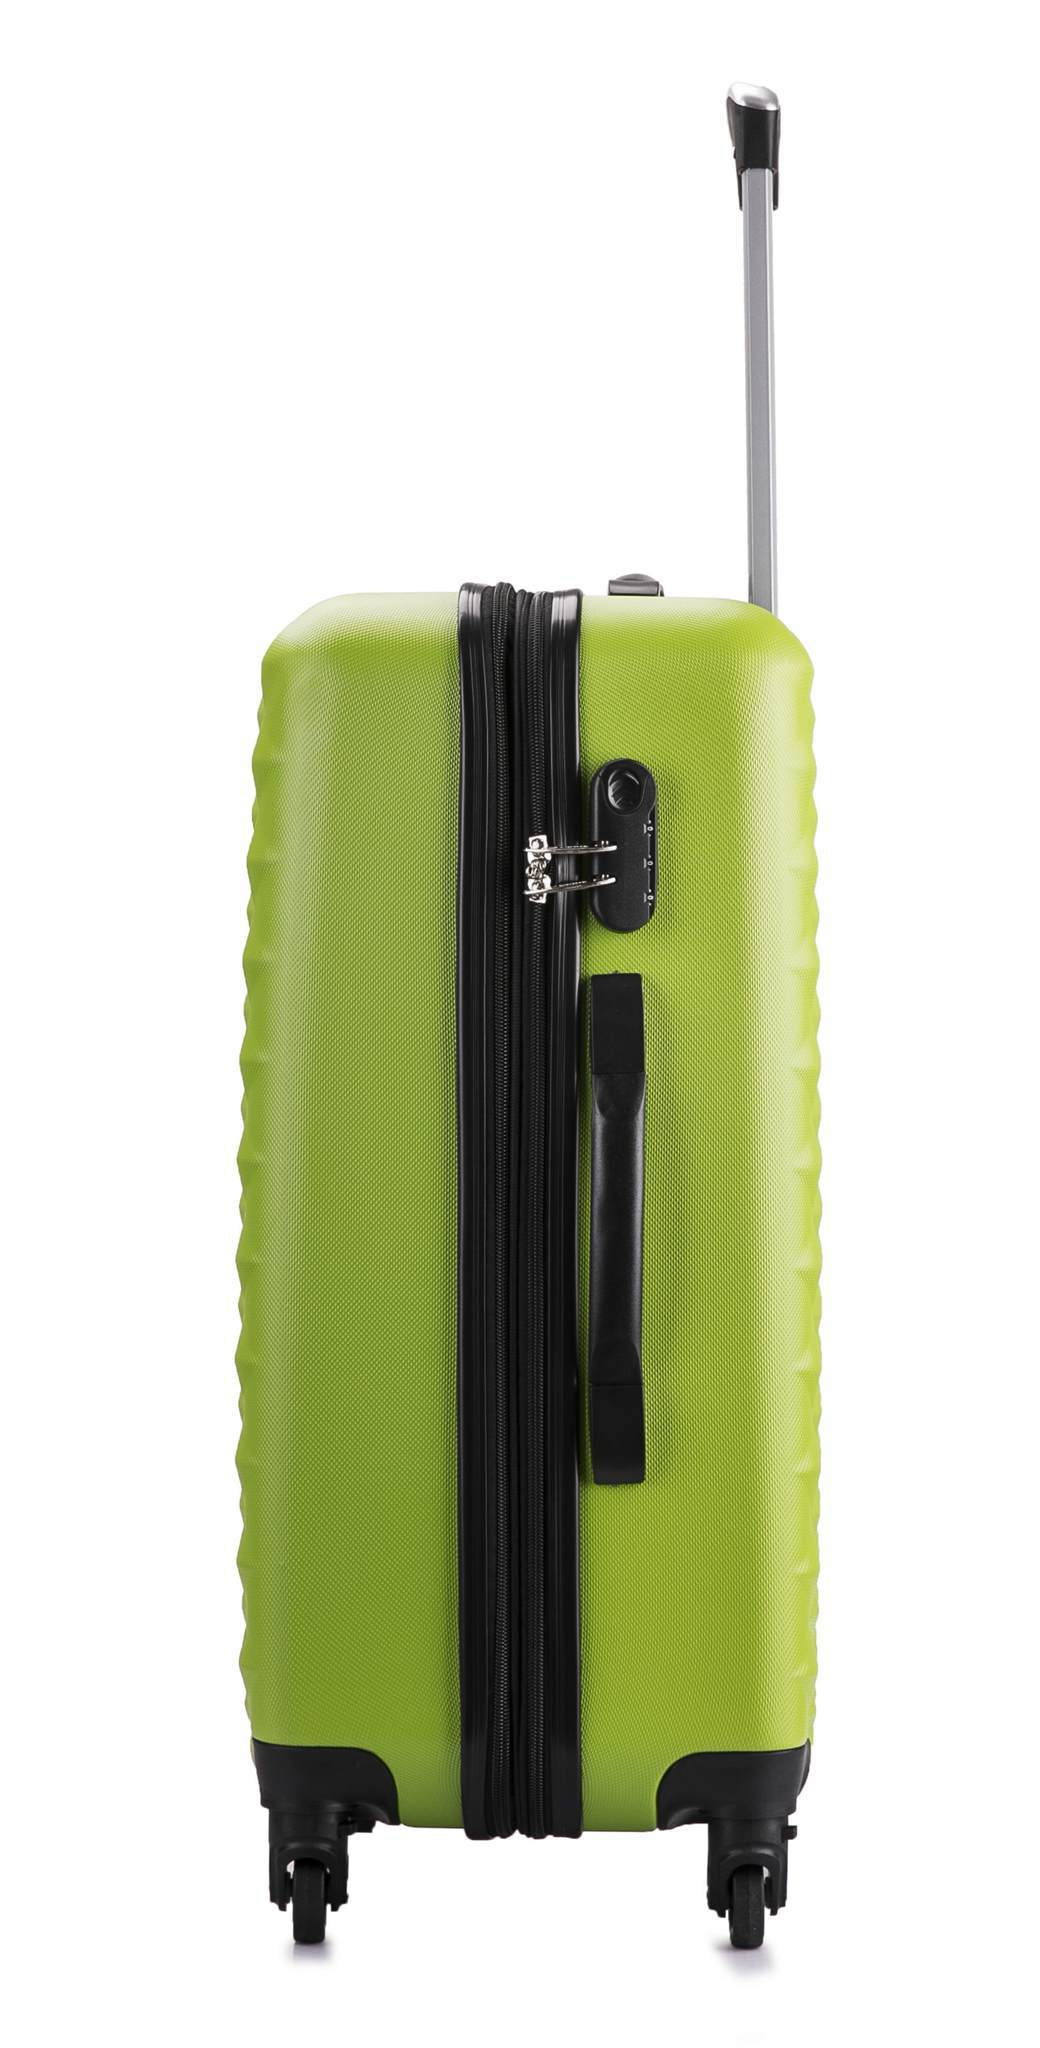 Чемодан с расширением L'case Phatthaya-24 Зеленый (M+)